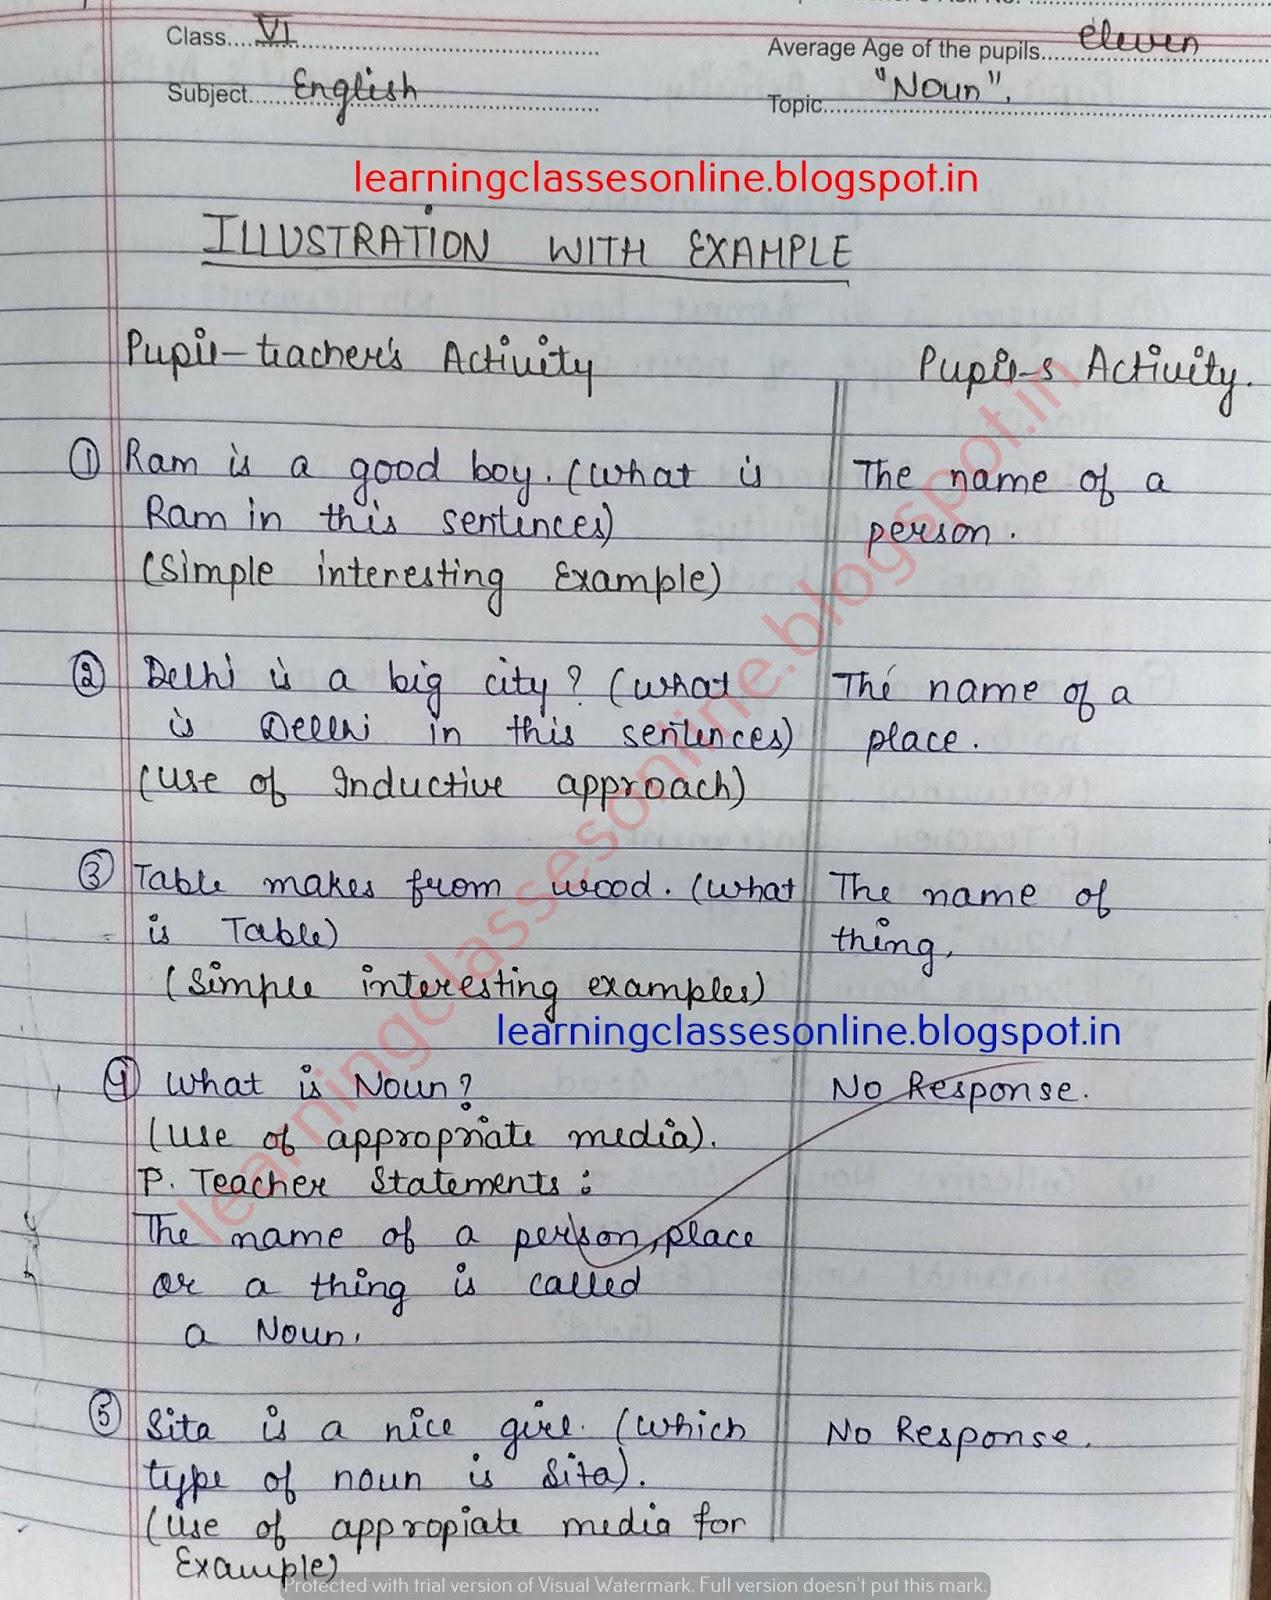 Microteaching Lesson Plan For English Grammar On Noun